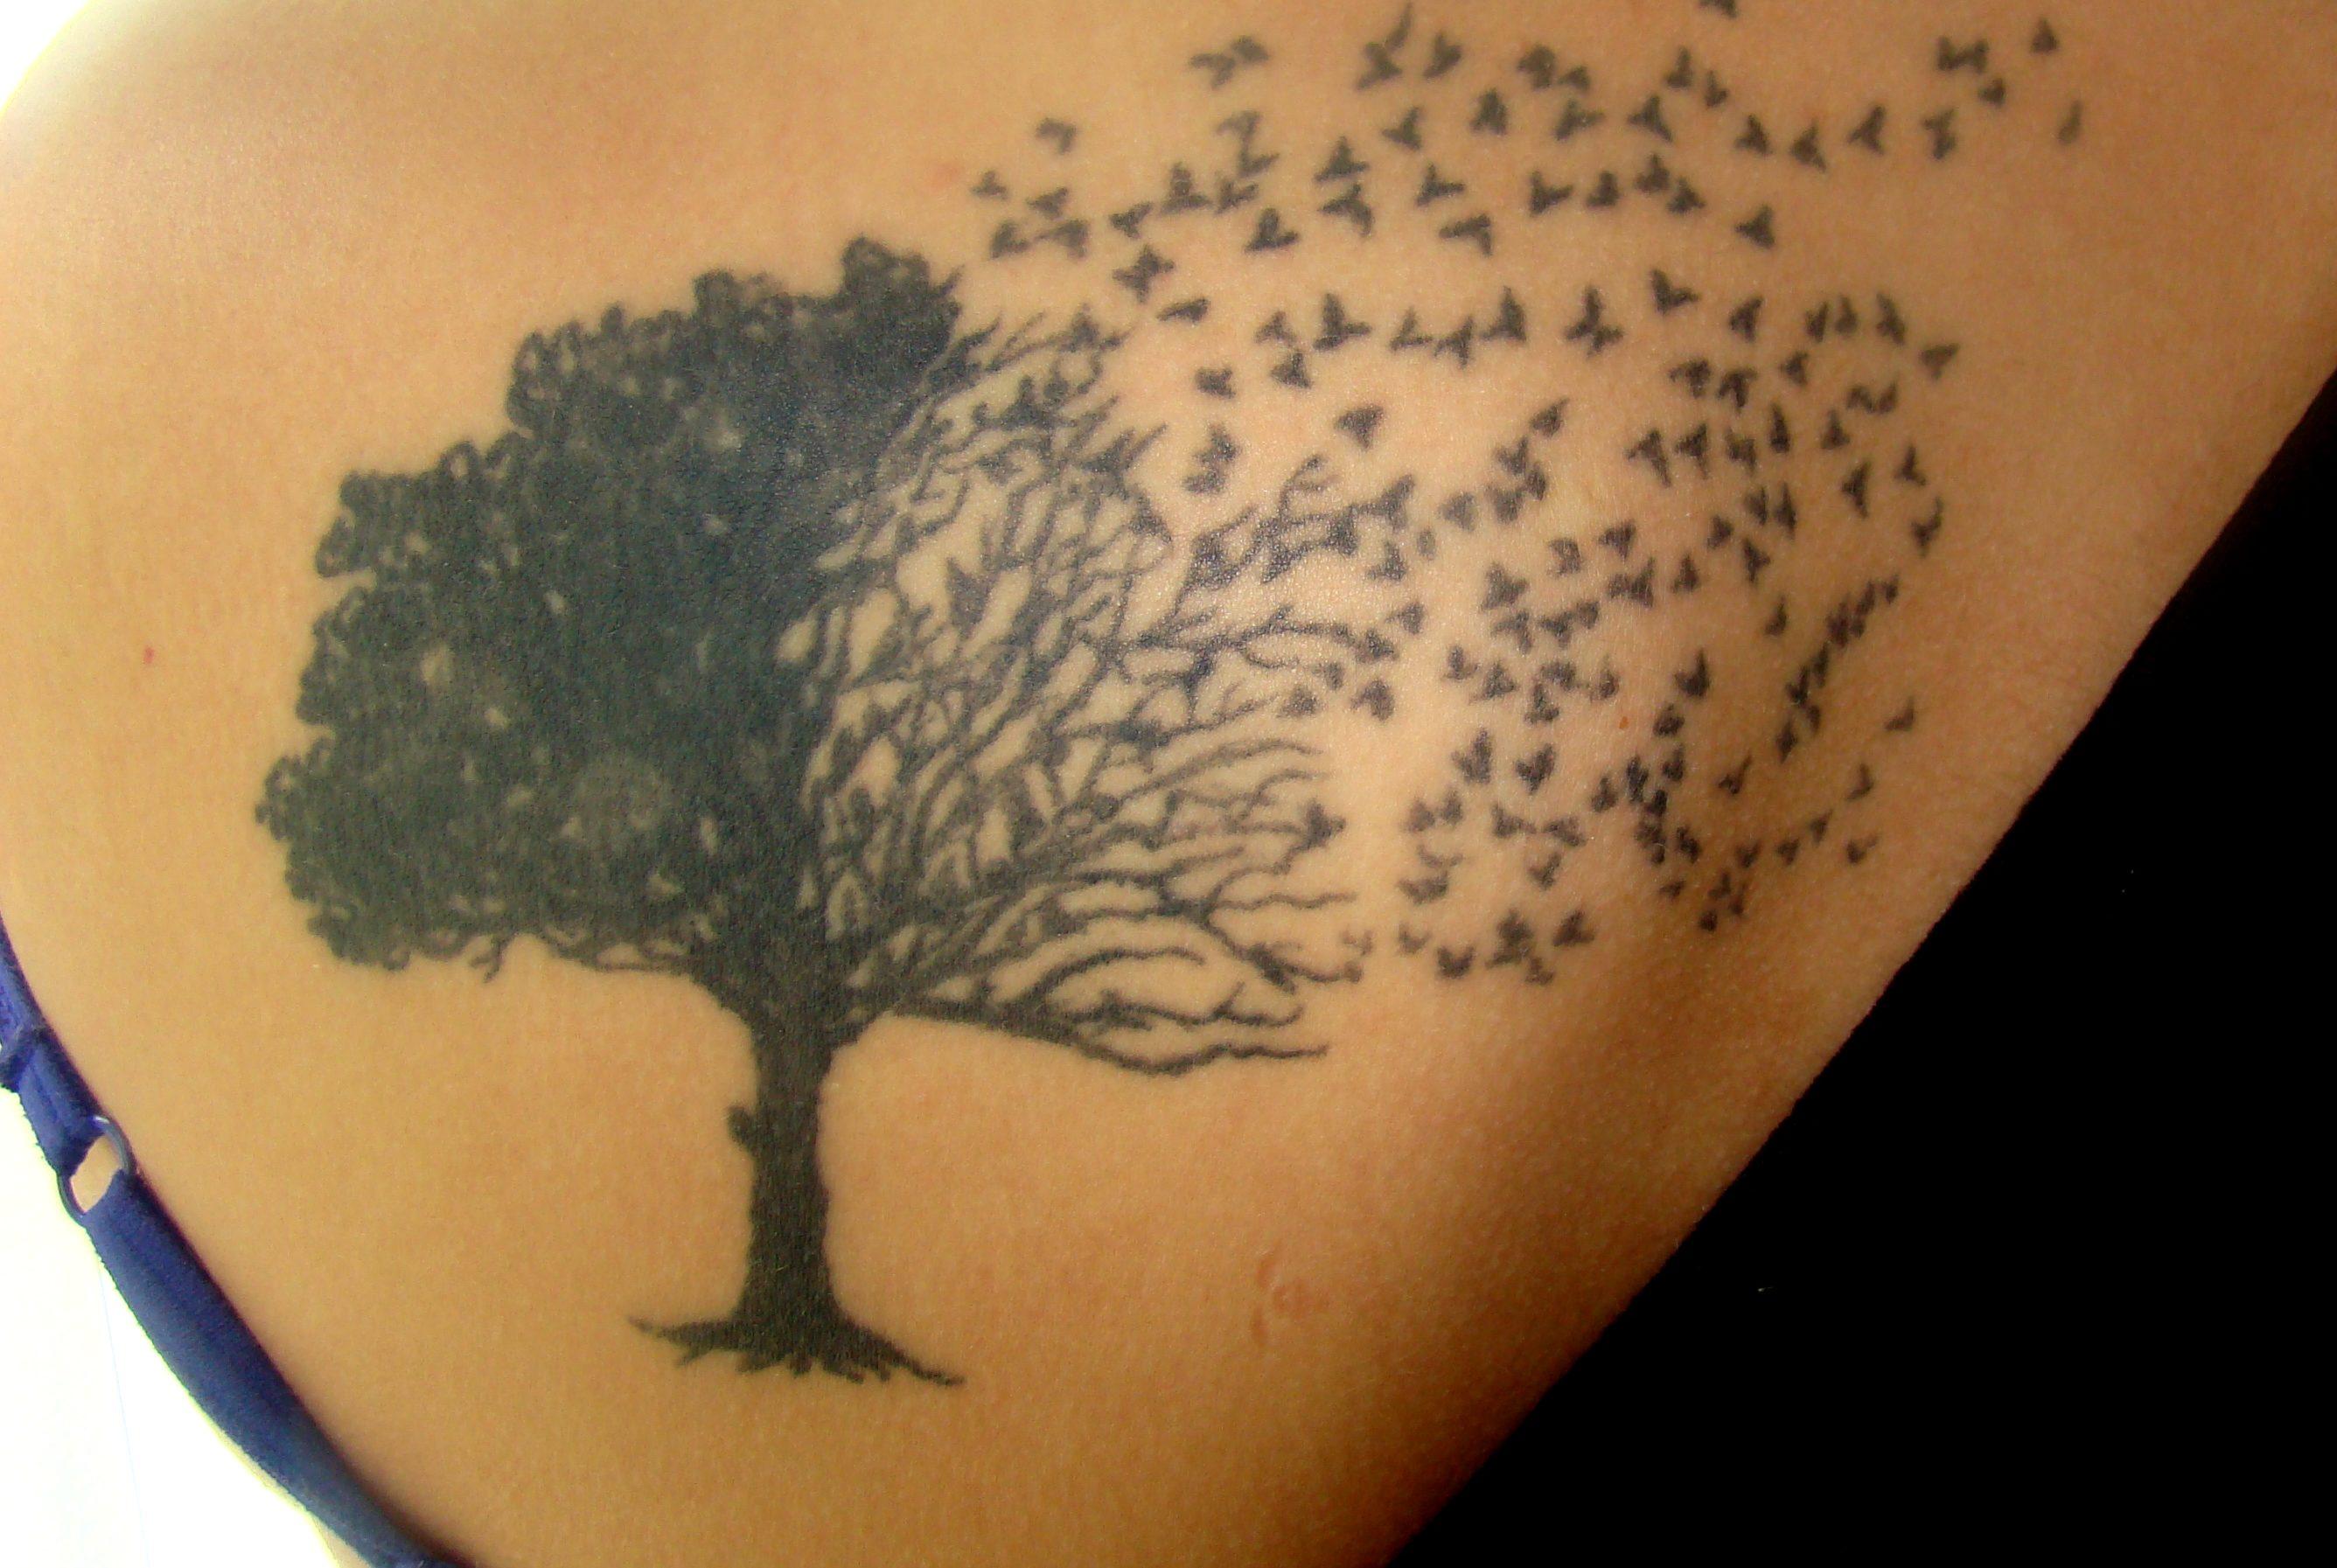 Baum Tattoo 9 Bedeutungen Hinter Dem Lebensbaum Desiredde